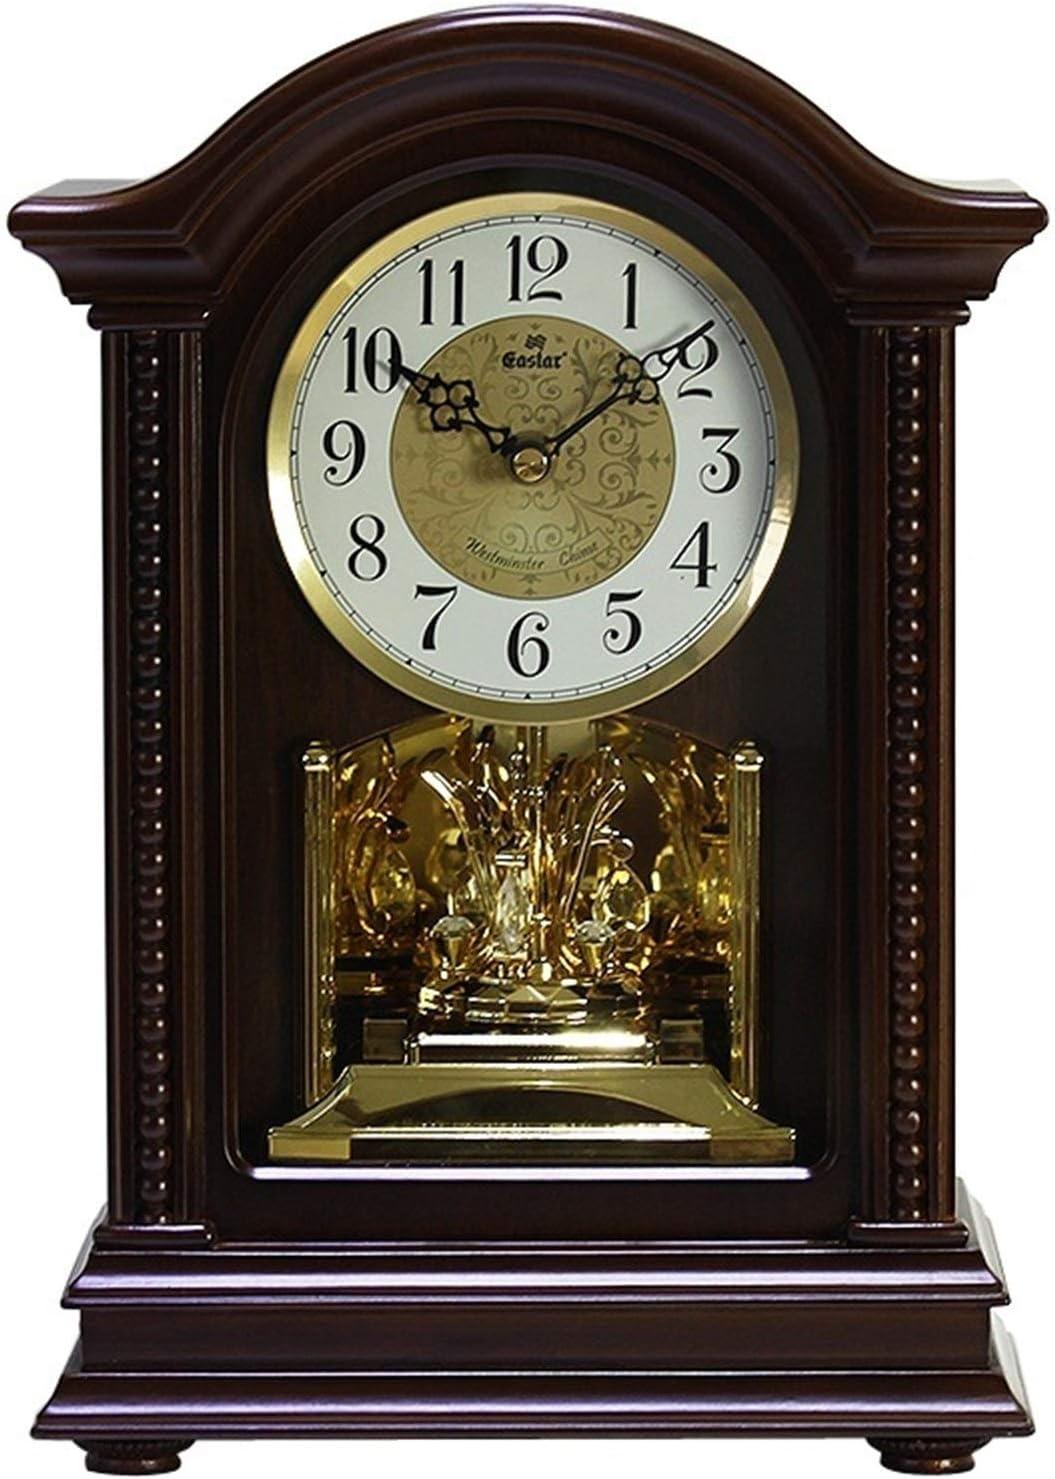 Vioaplem Estilo Europeo de música de Madera Reloj Antiguo por Hora de Reloj de Cuarzo Escritorio Sala de Estar Decoración Reloj de la Chimenea Relojes de Chimenea